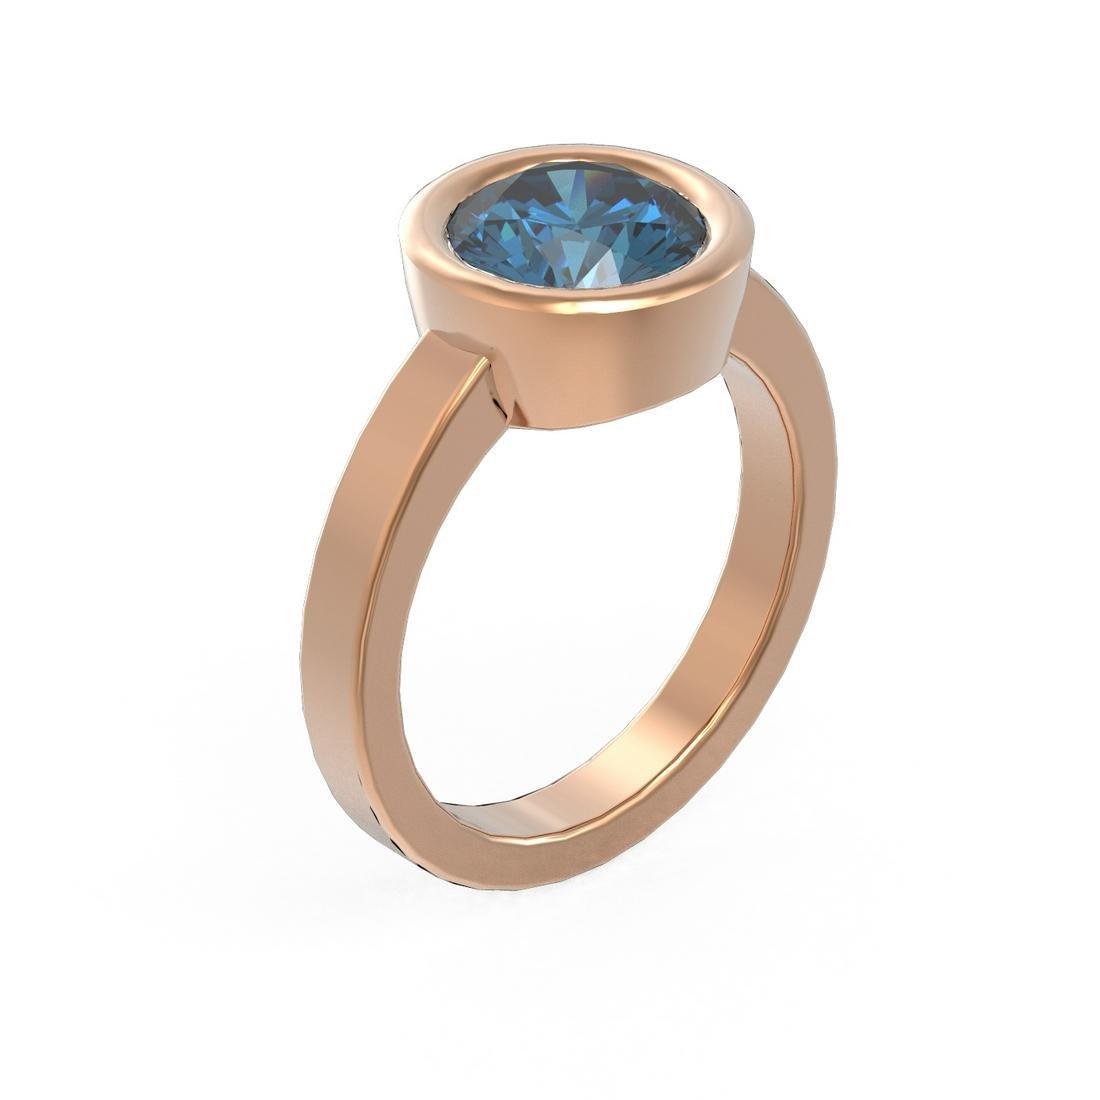 2 ctw Intense Blue Diamond Ring 18K Rose Gold -